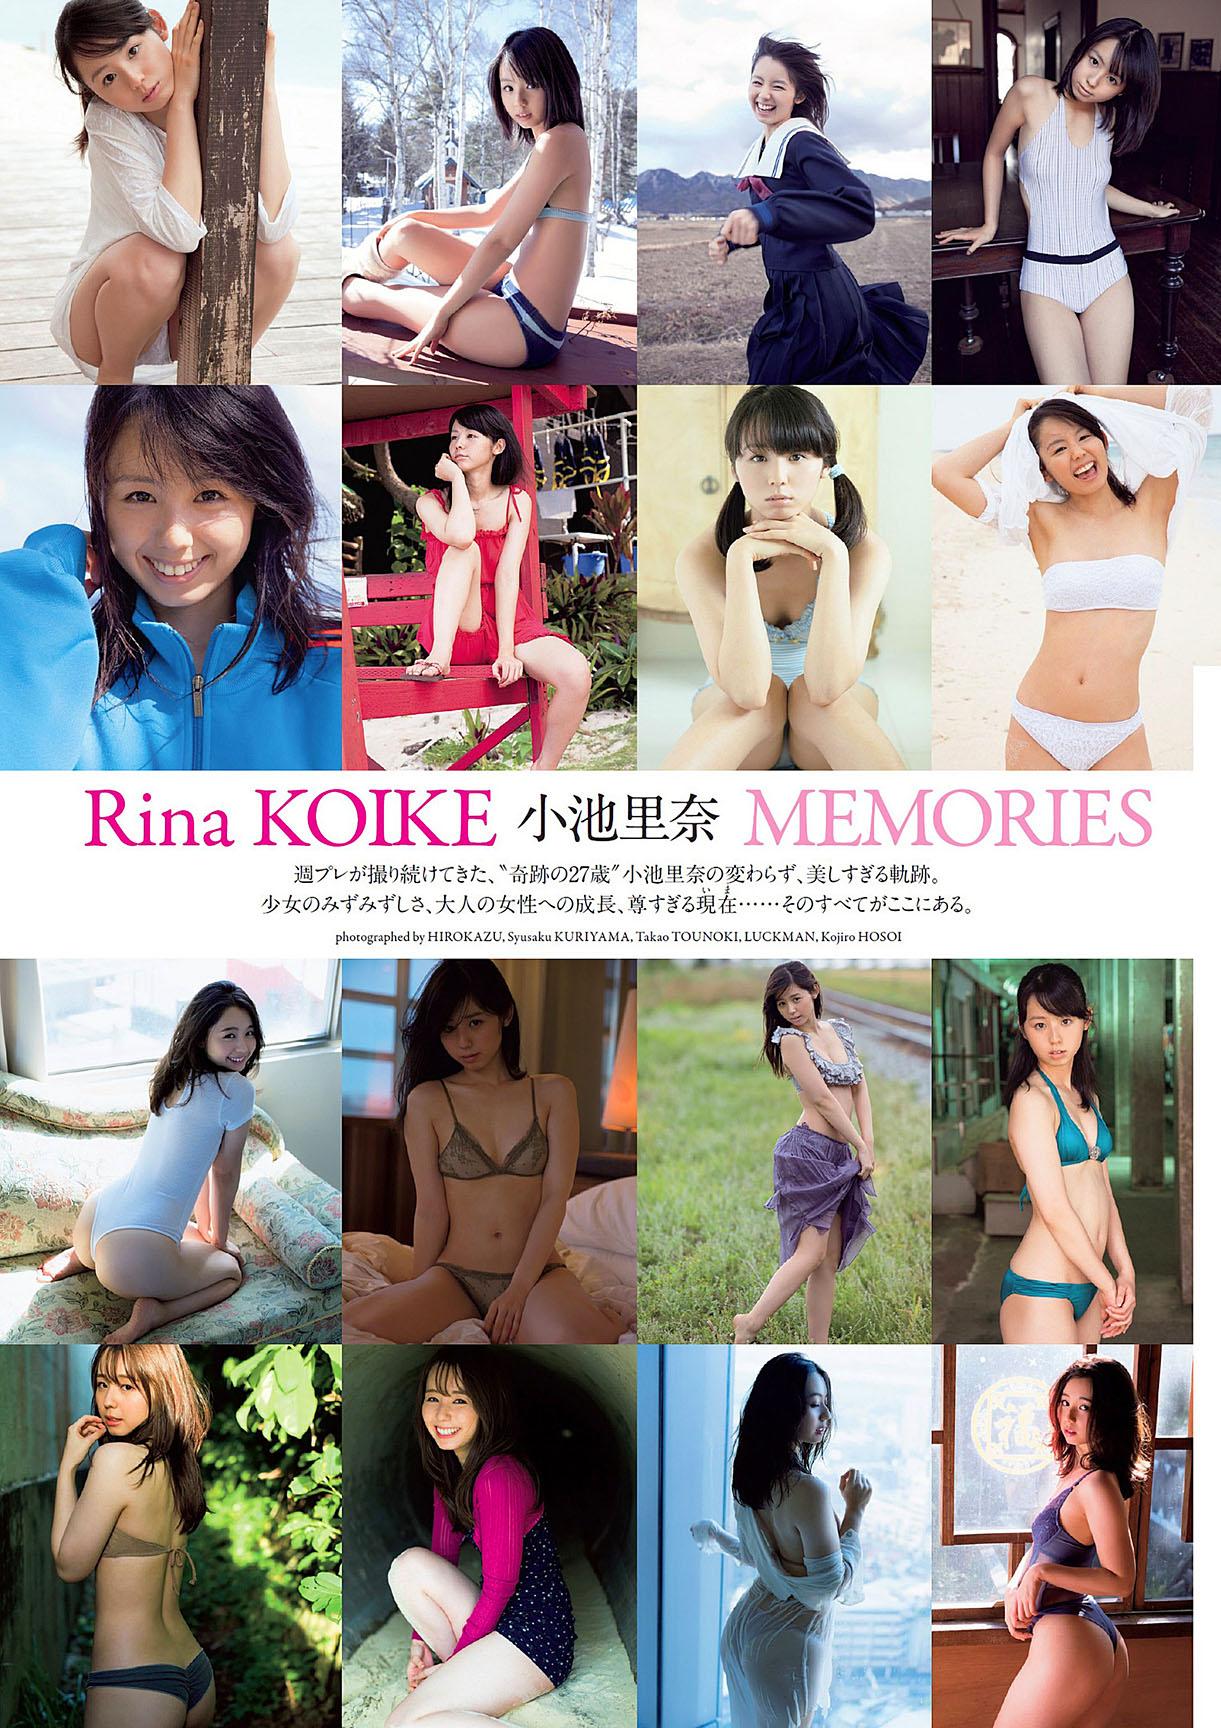 Rina Koike WPB 210111 00.jpg